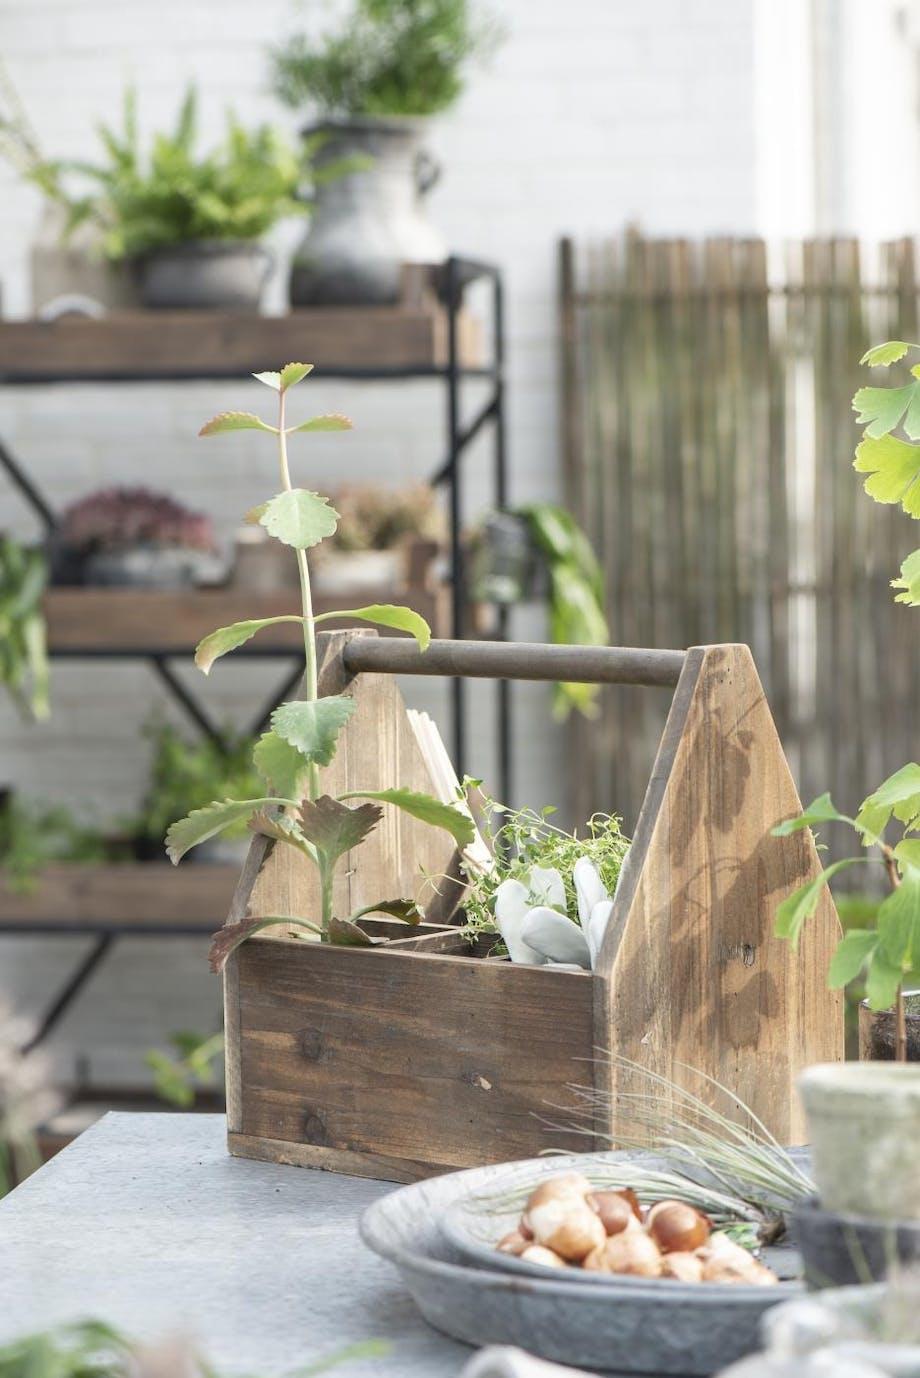 trækasse til planter havekurv